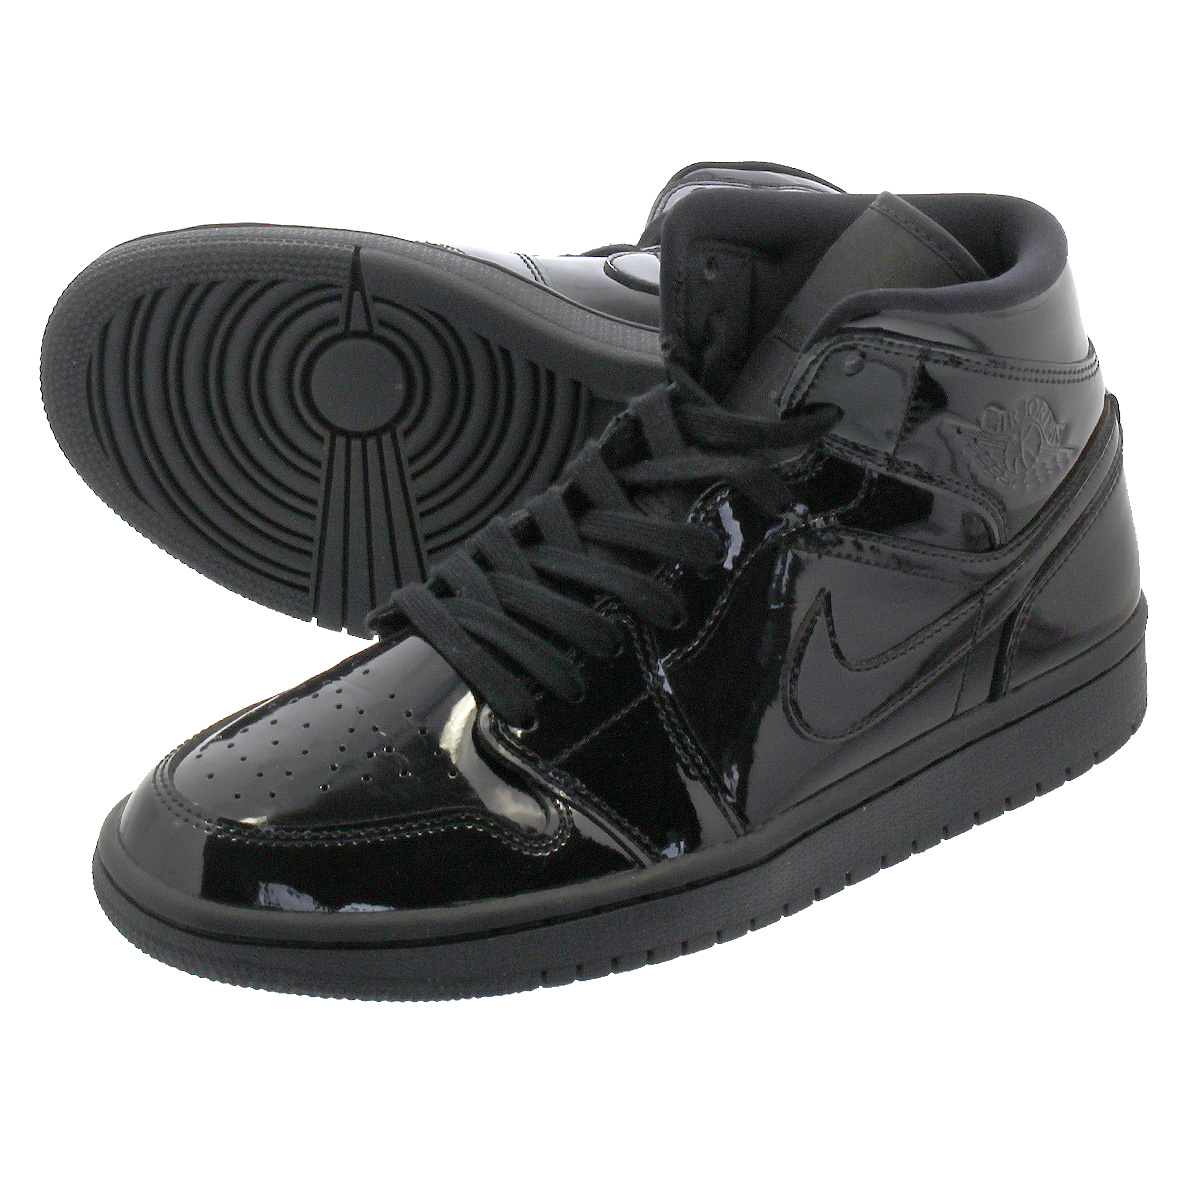 64ad7161da3a NIKE WMNS AIR JORDAN 1 MID SE Nike women Air Jordan 1 mid SE BLACK/ ...